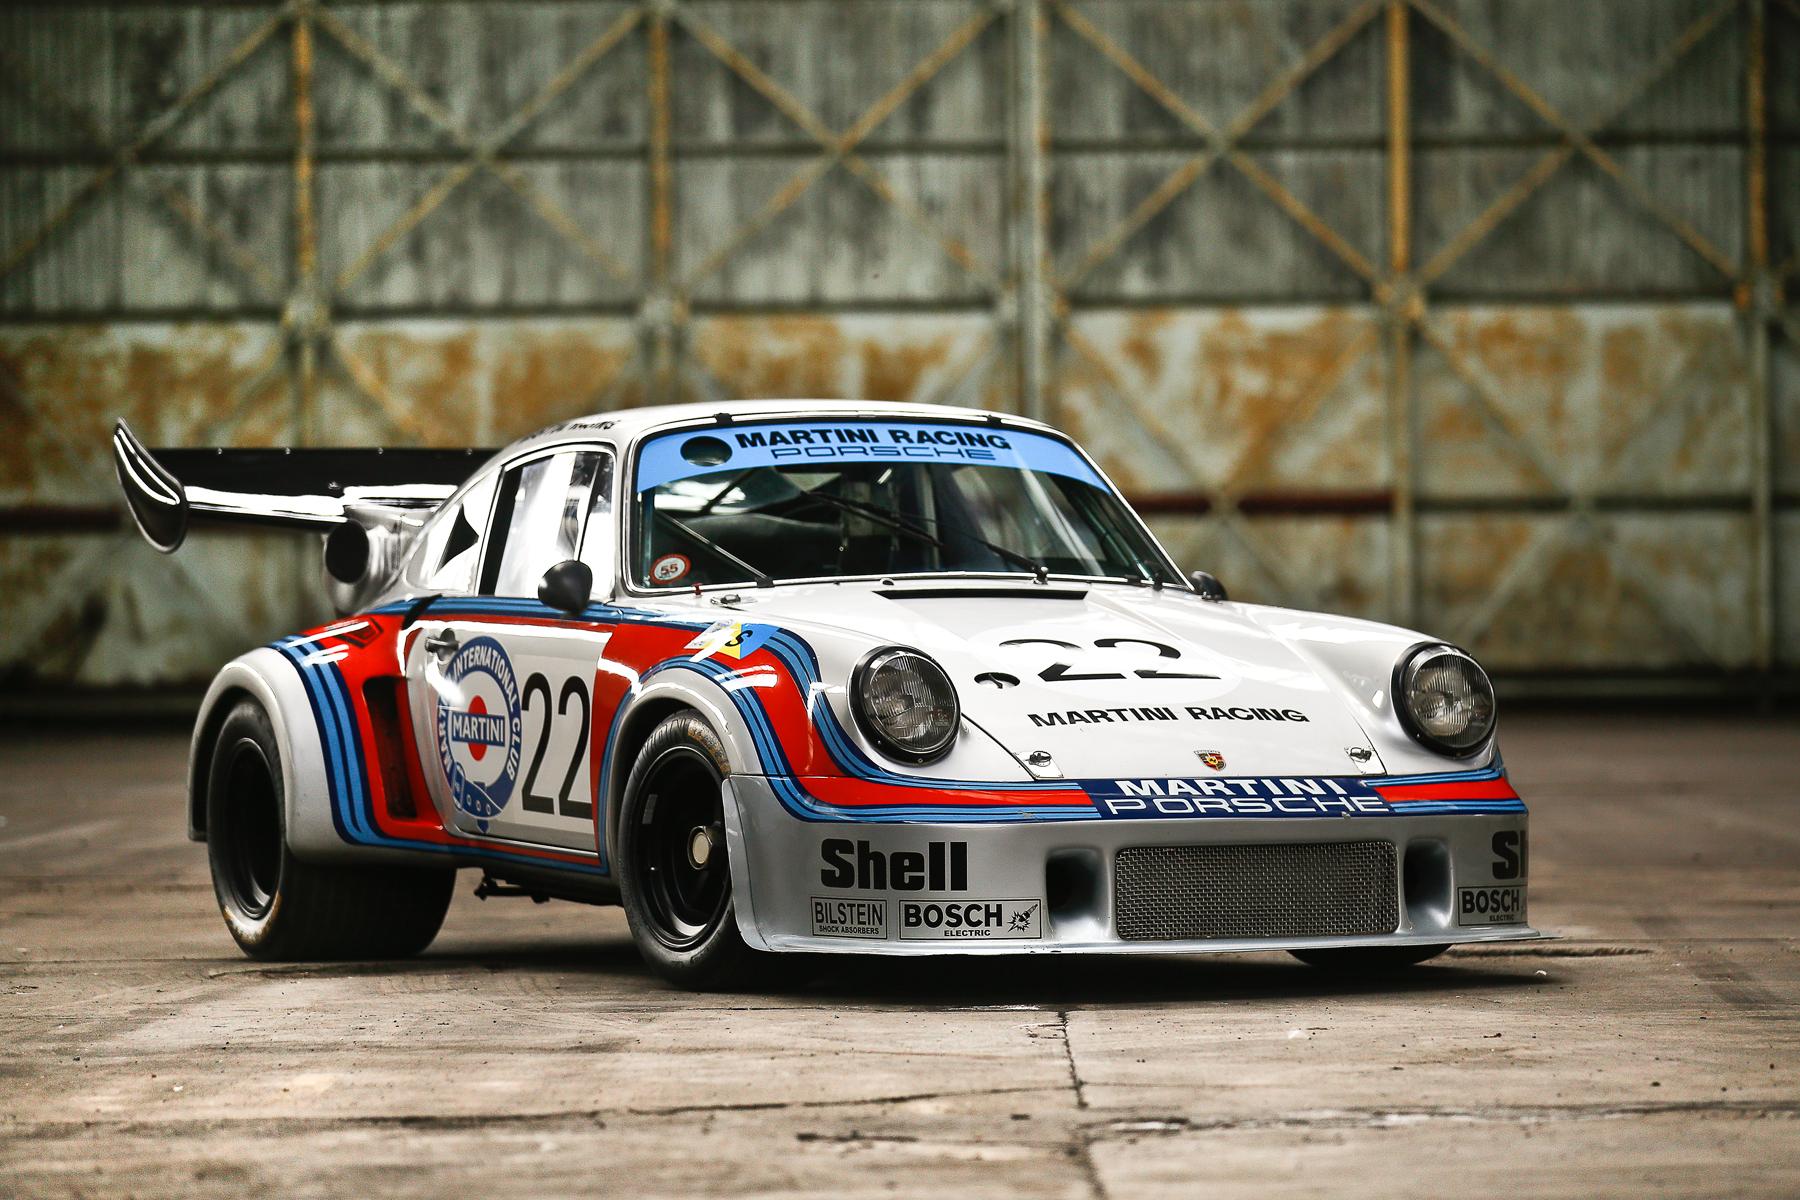 1974 Porsche 911 Carrera RSR 2.1 Turbo race car